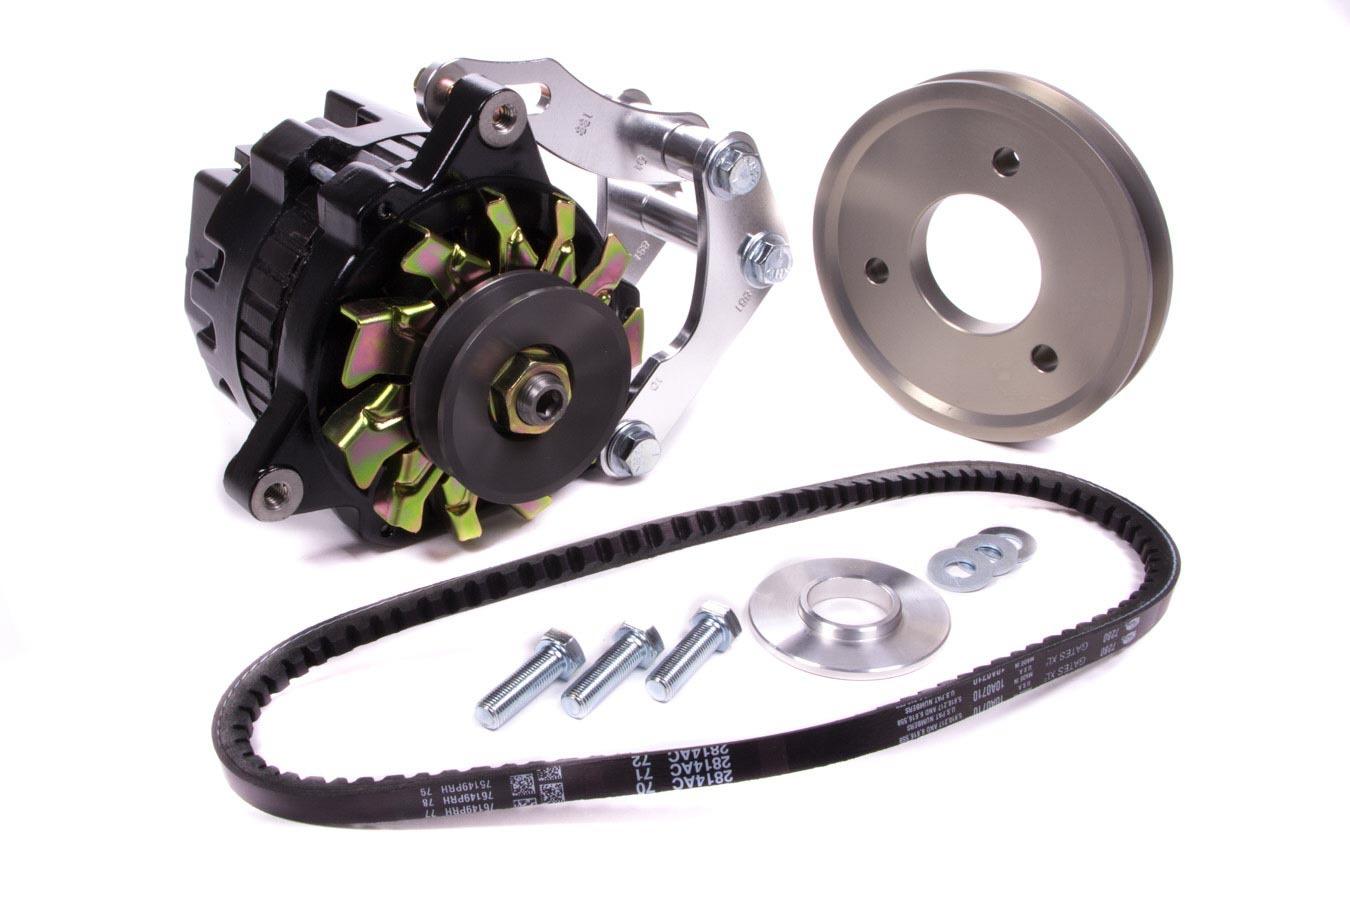 Pro Series Snug Mount Alternator- Mounting Kit